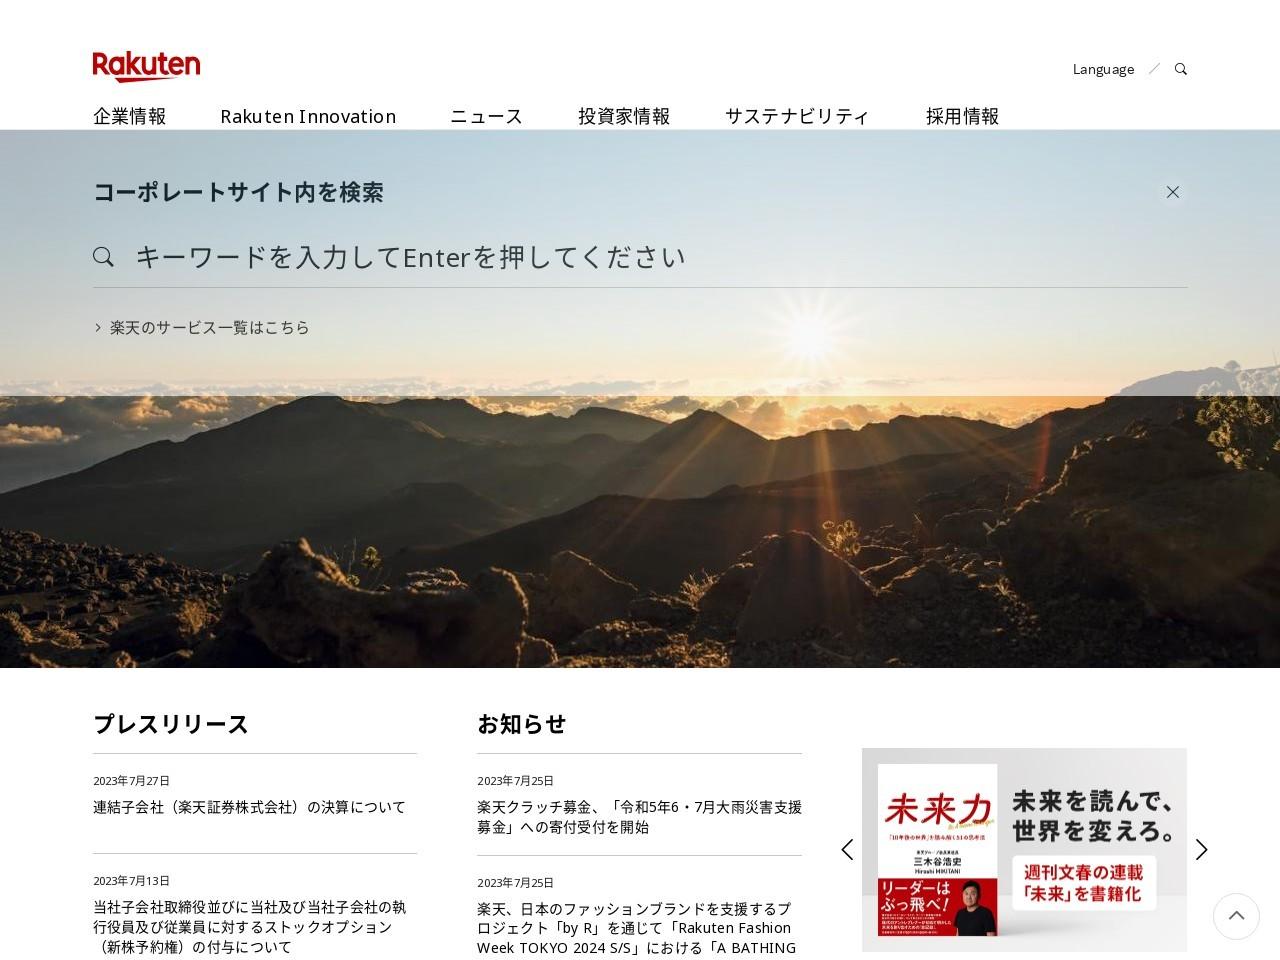 https%3A%2F%2Fcorp.rakuten.co.jp%2Fdonation%2Fhokkaido201809 ja%2Finput ja - 【北海道地震】北海道地震義援金まとめ。日本試練の年、今回もVAPERとしてできる限りのことはしたい。